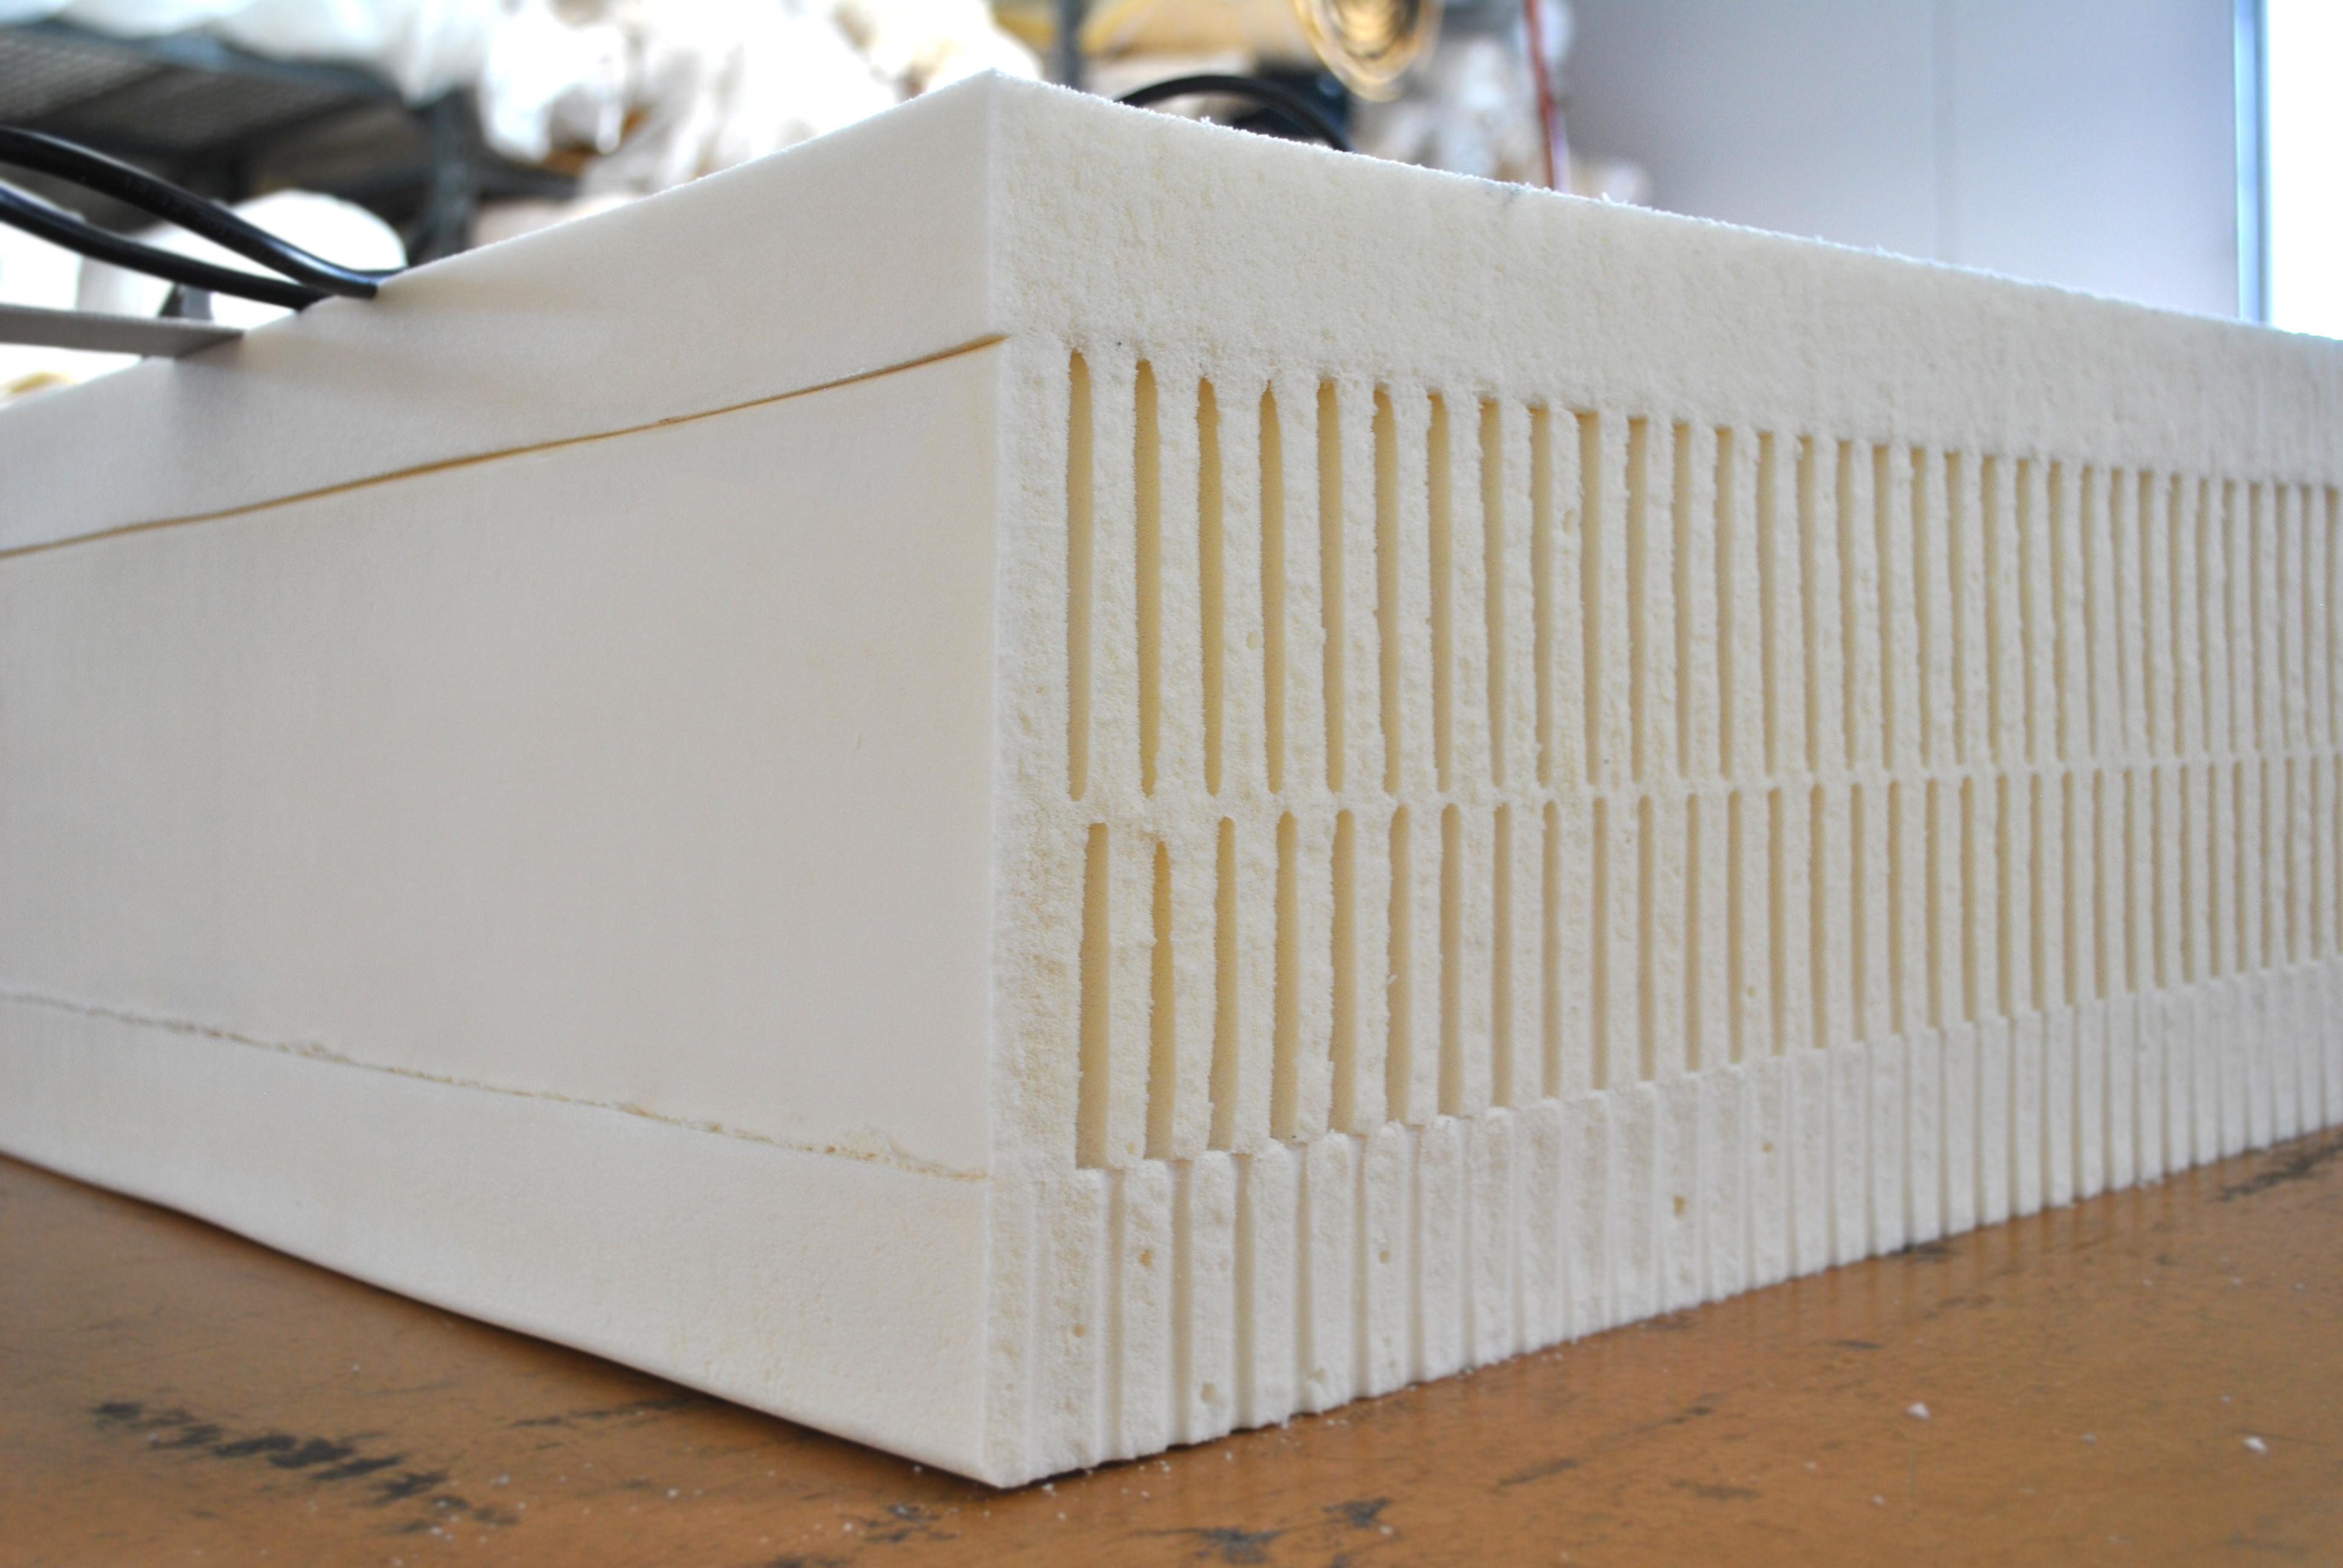 latex mattress phoenix adjustable beds natural foam organic